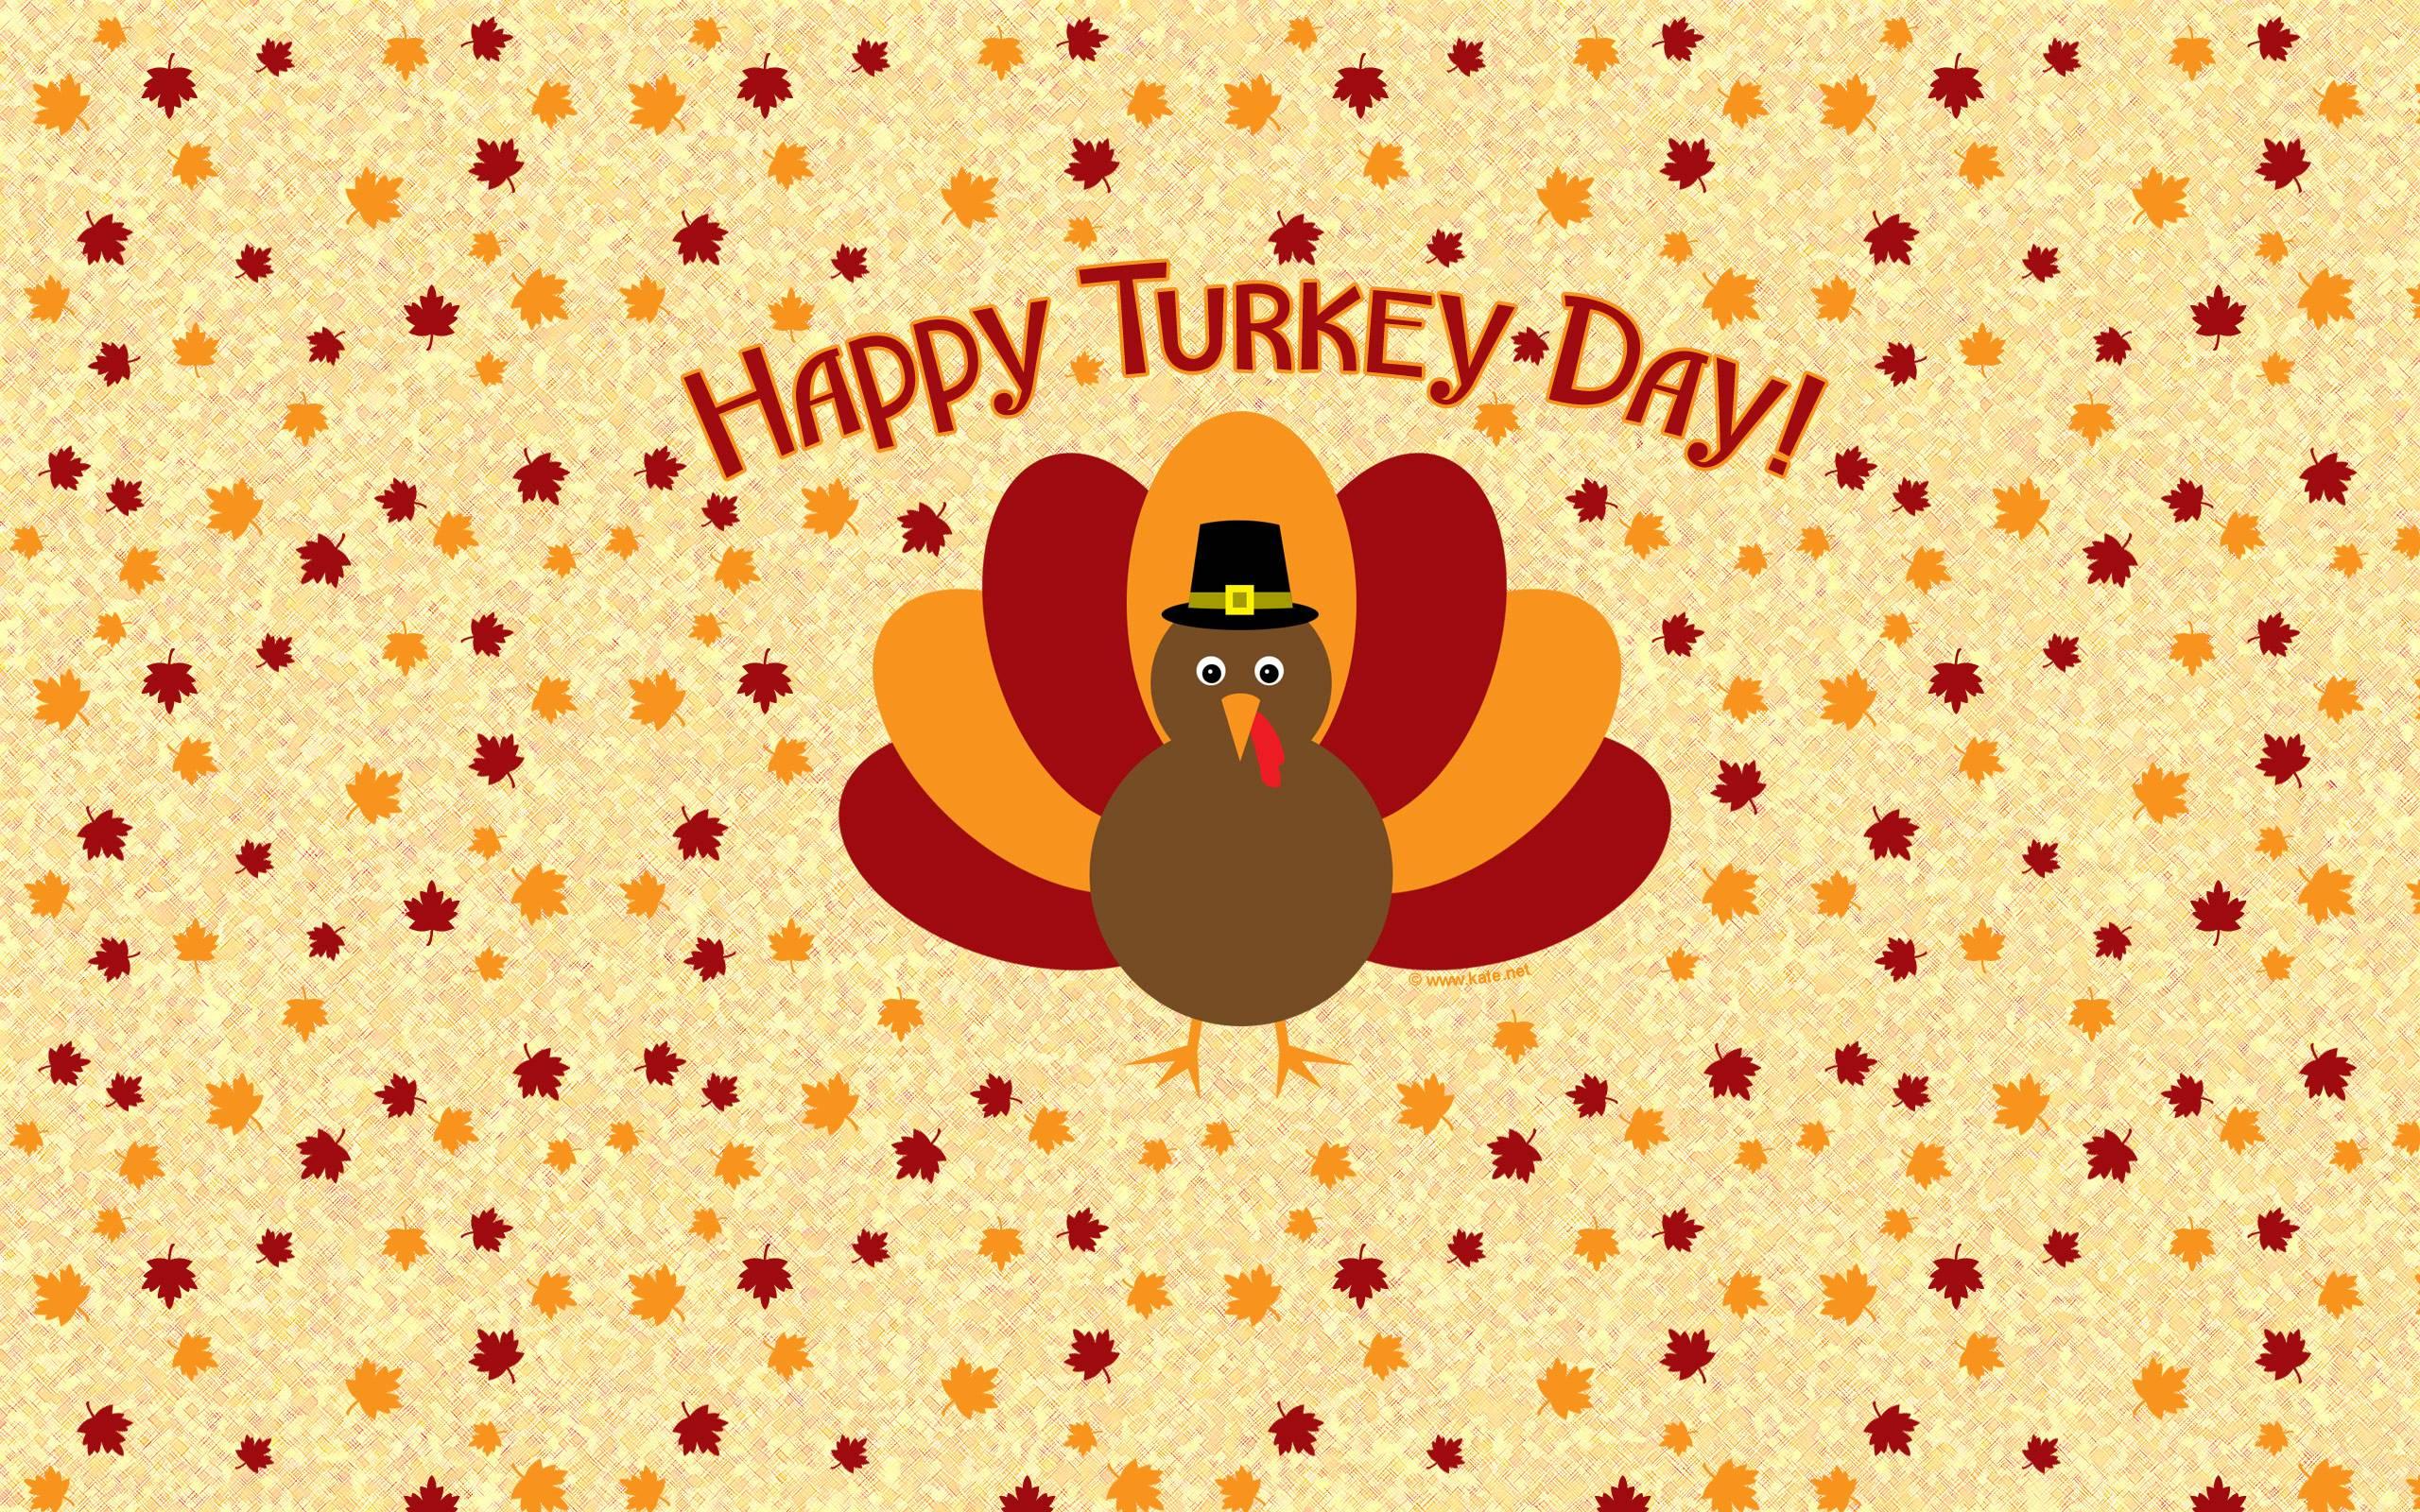 Free Turkey Wallpaper